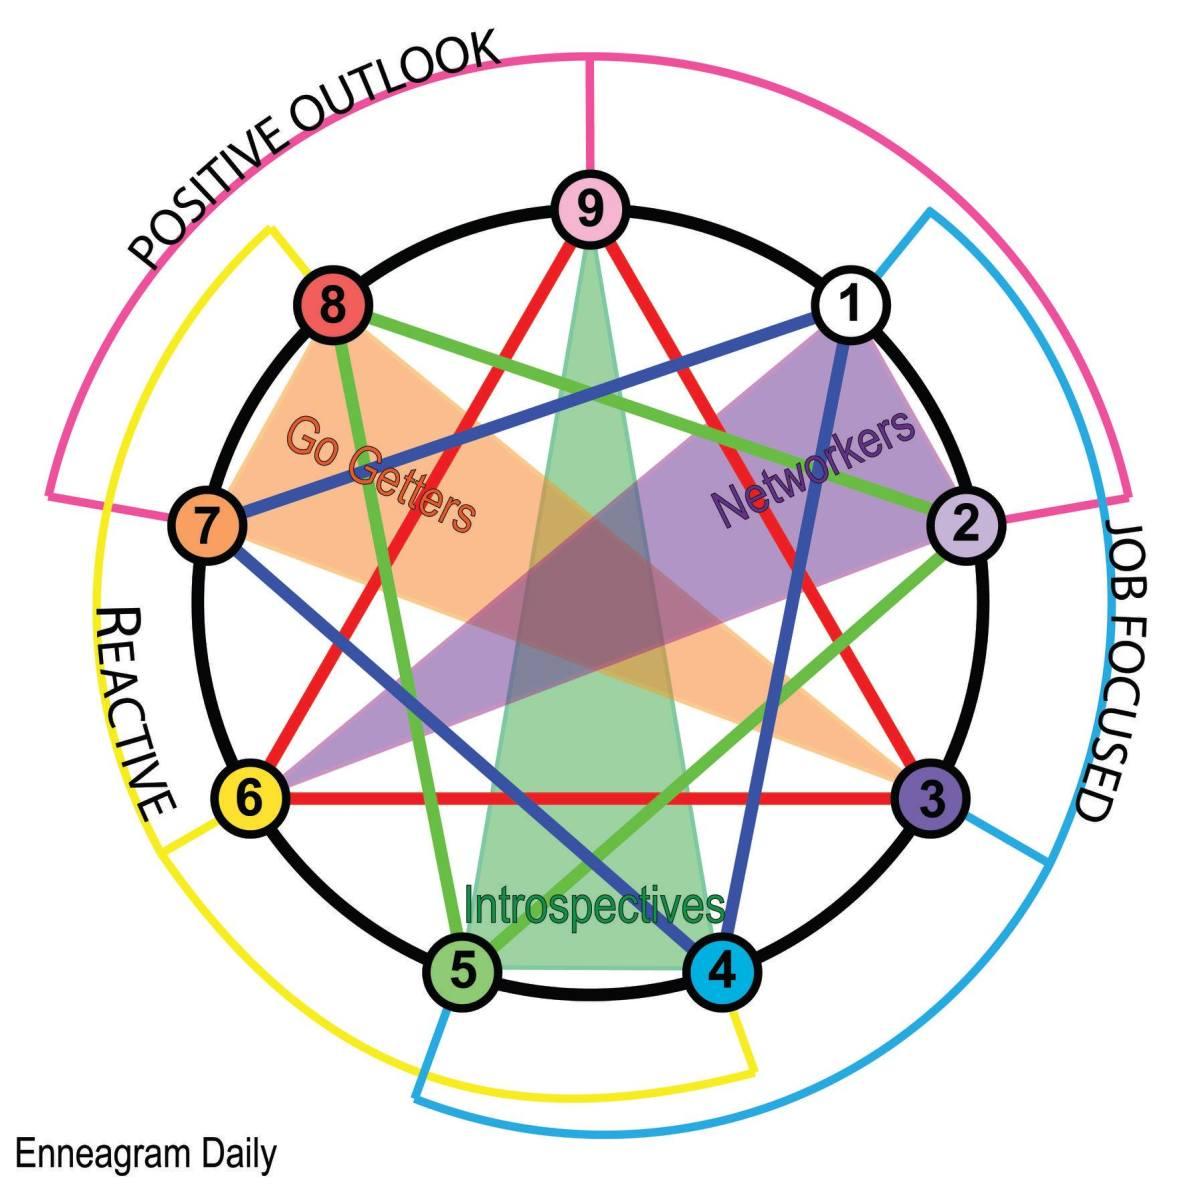 1. Intelligence Center 2. Object Relations Group 3. Harmonic Group 4. Hornevian Group